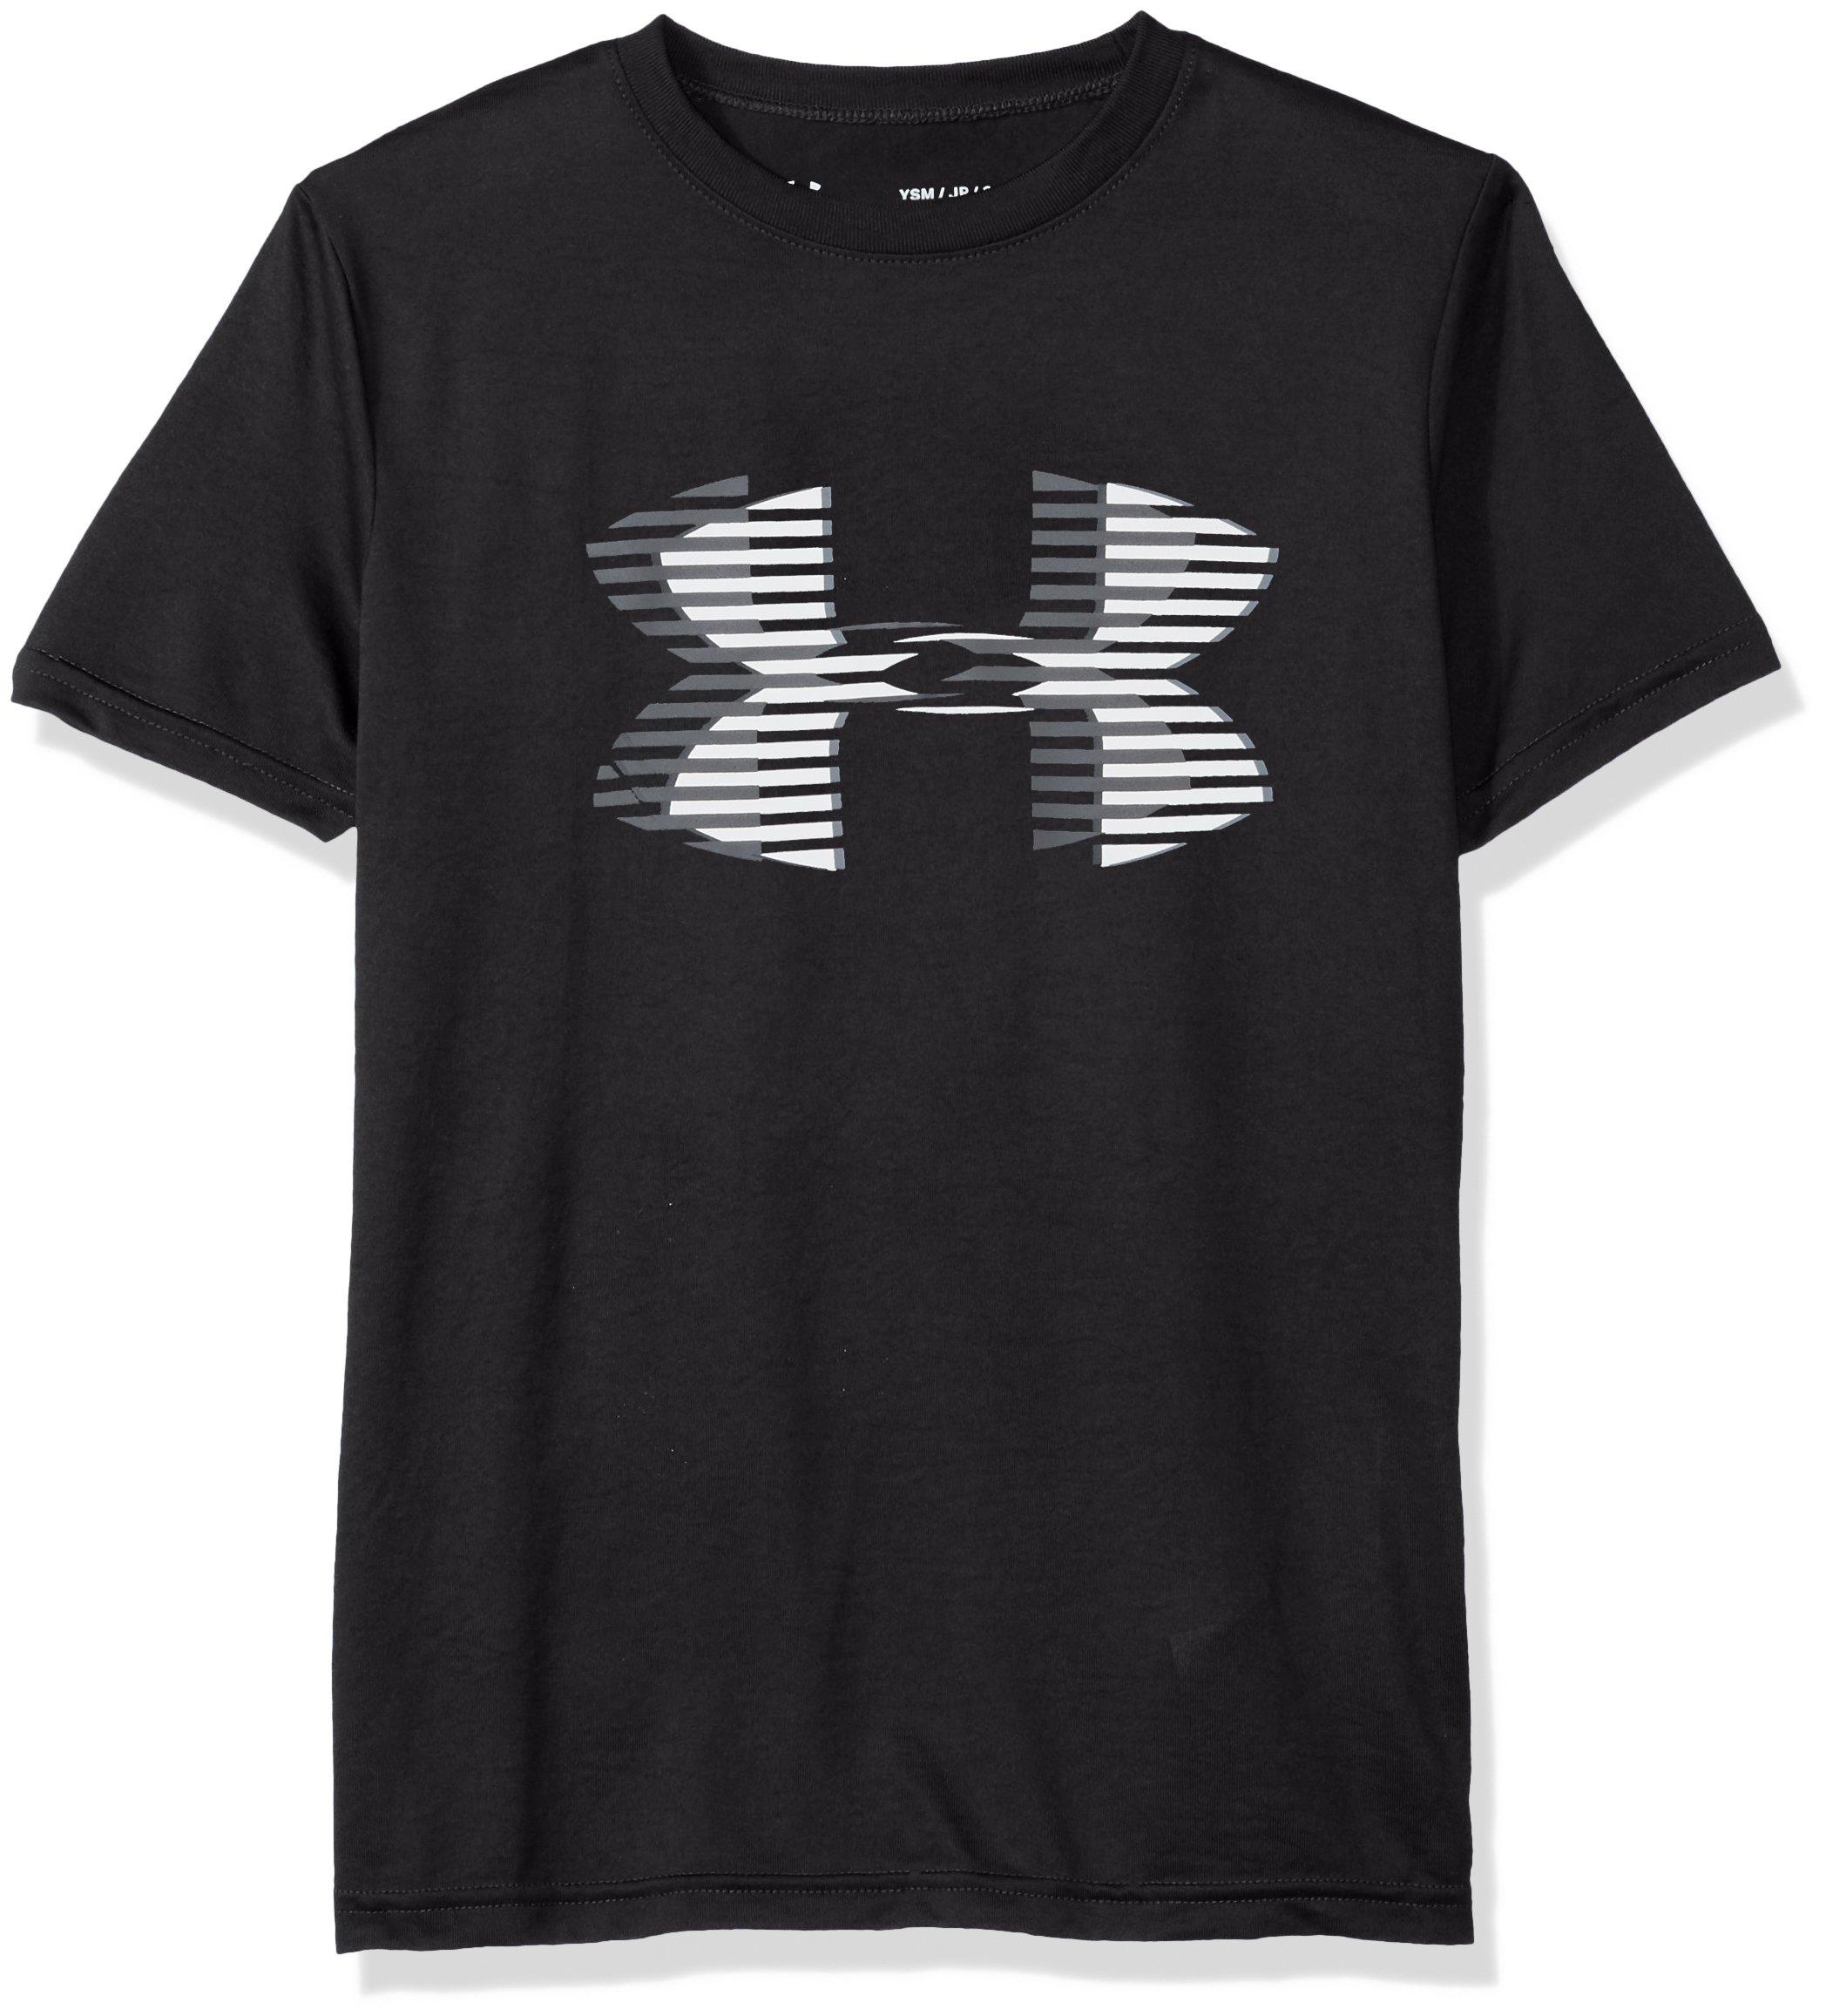 Under Armour Boys' Tech Big Logo Solid T-Shirt, Black (001)/Steel, Youth X-Small